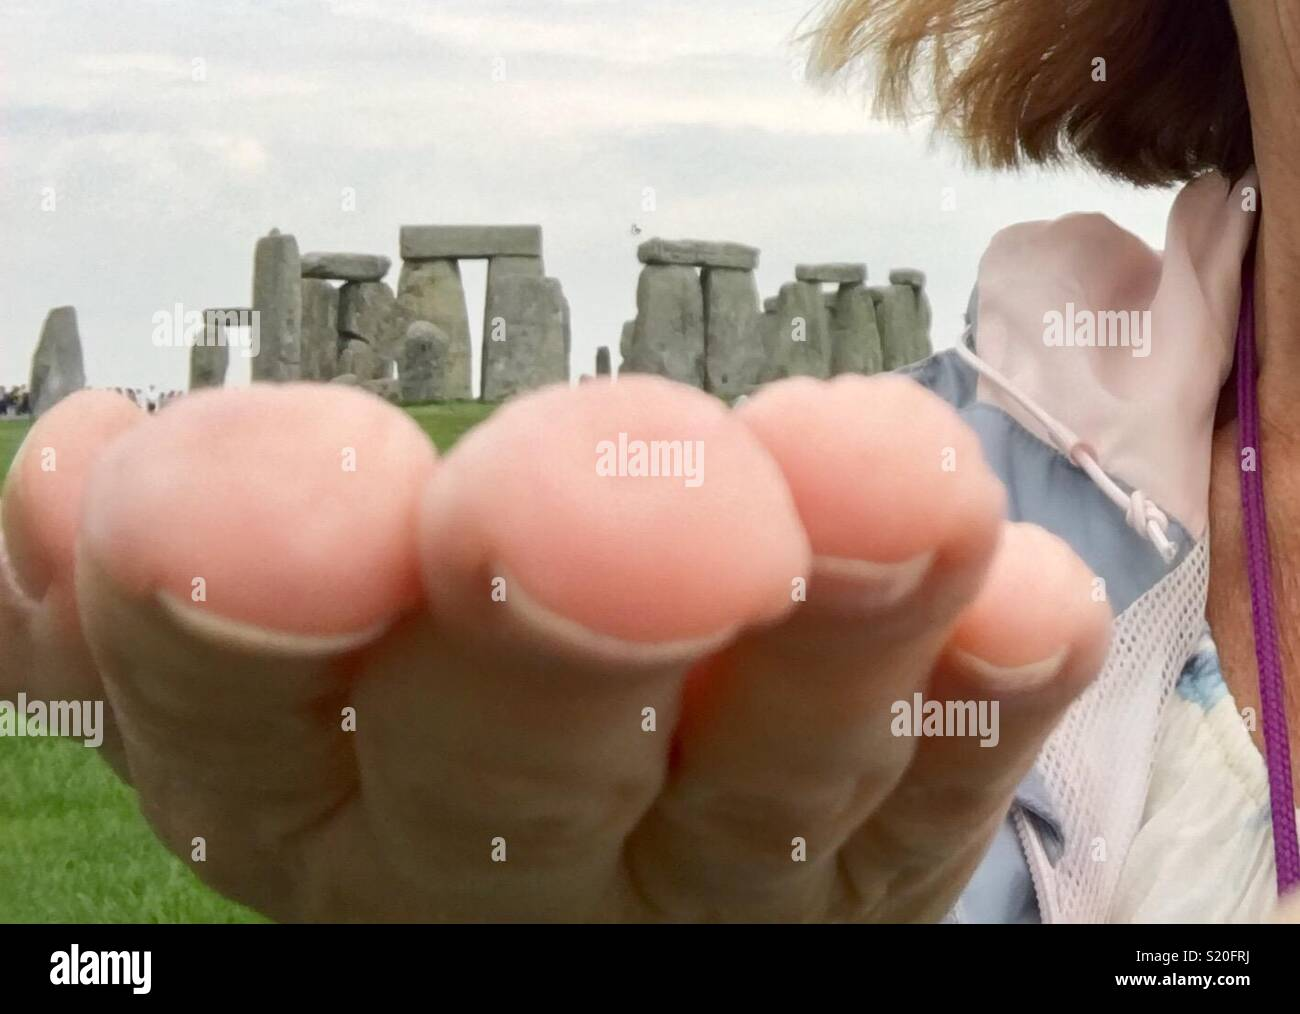 holding-stonehenge-in-my-hand-S20FRJ.jpg